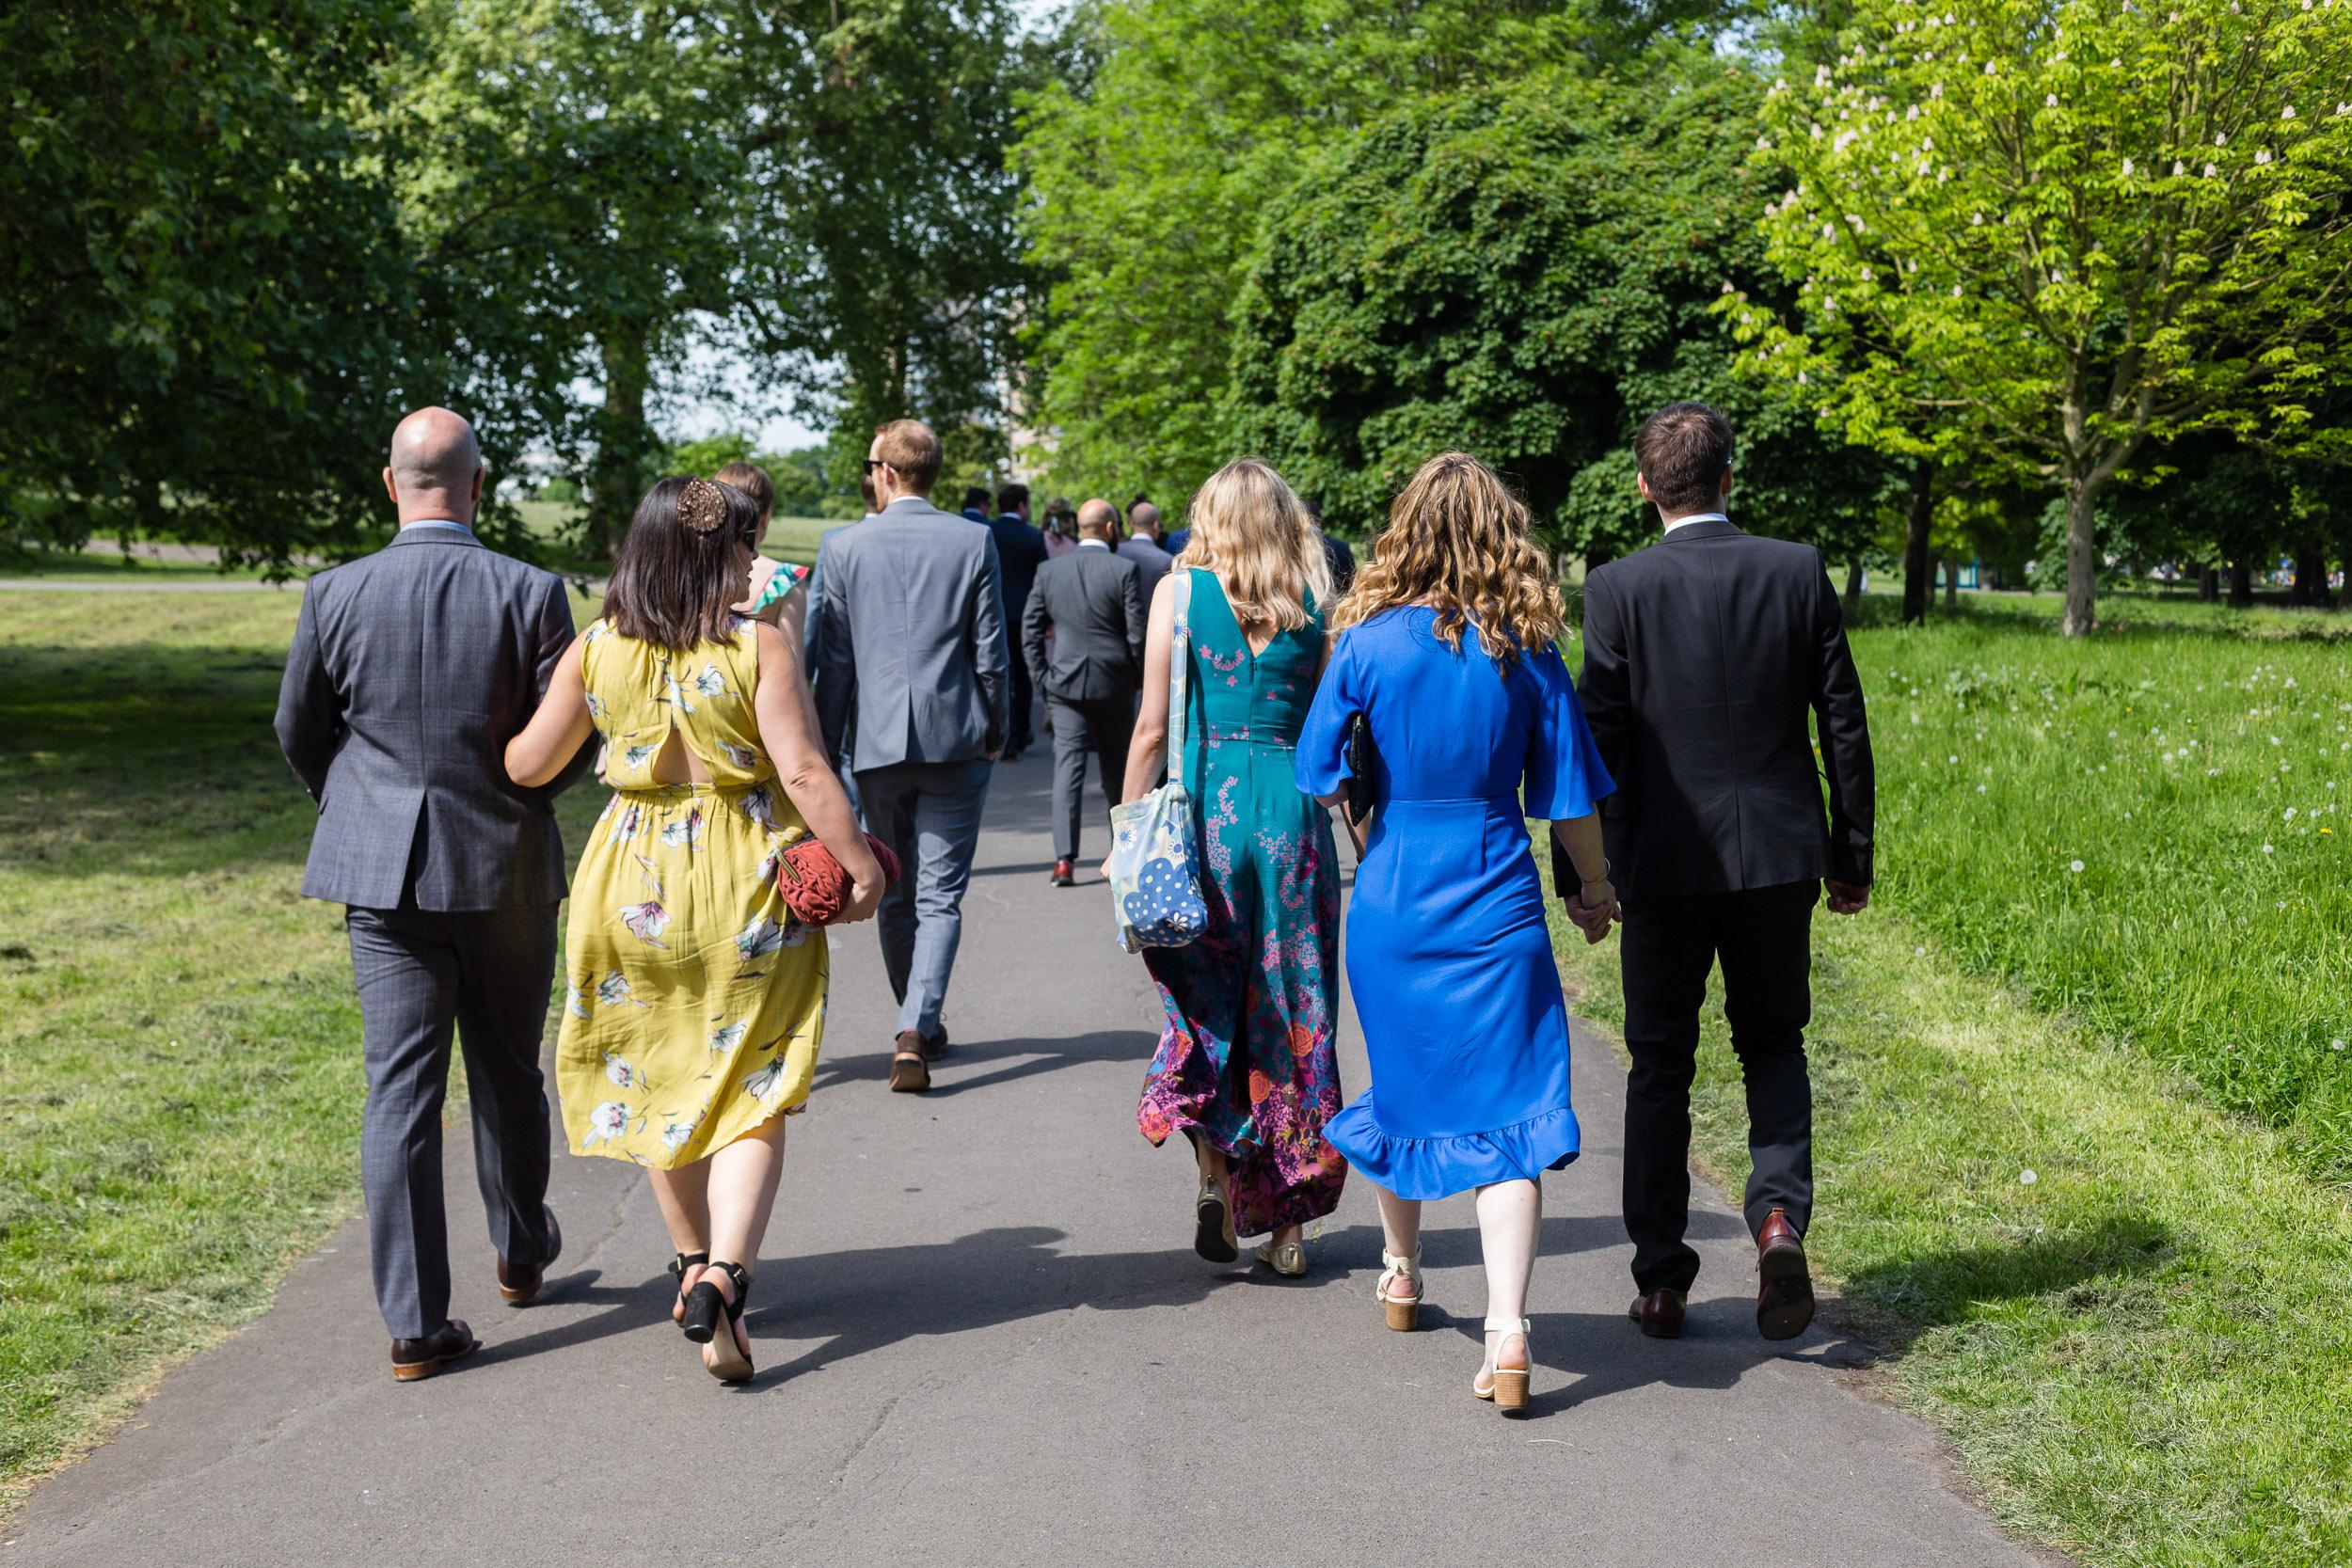 brockwell-lido-brixton-herne-hill-wedding-098.jpg